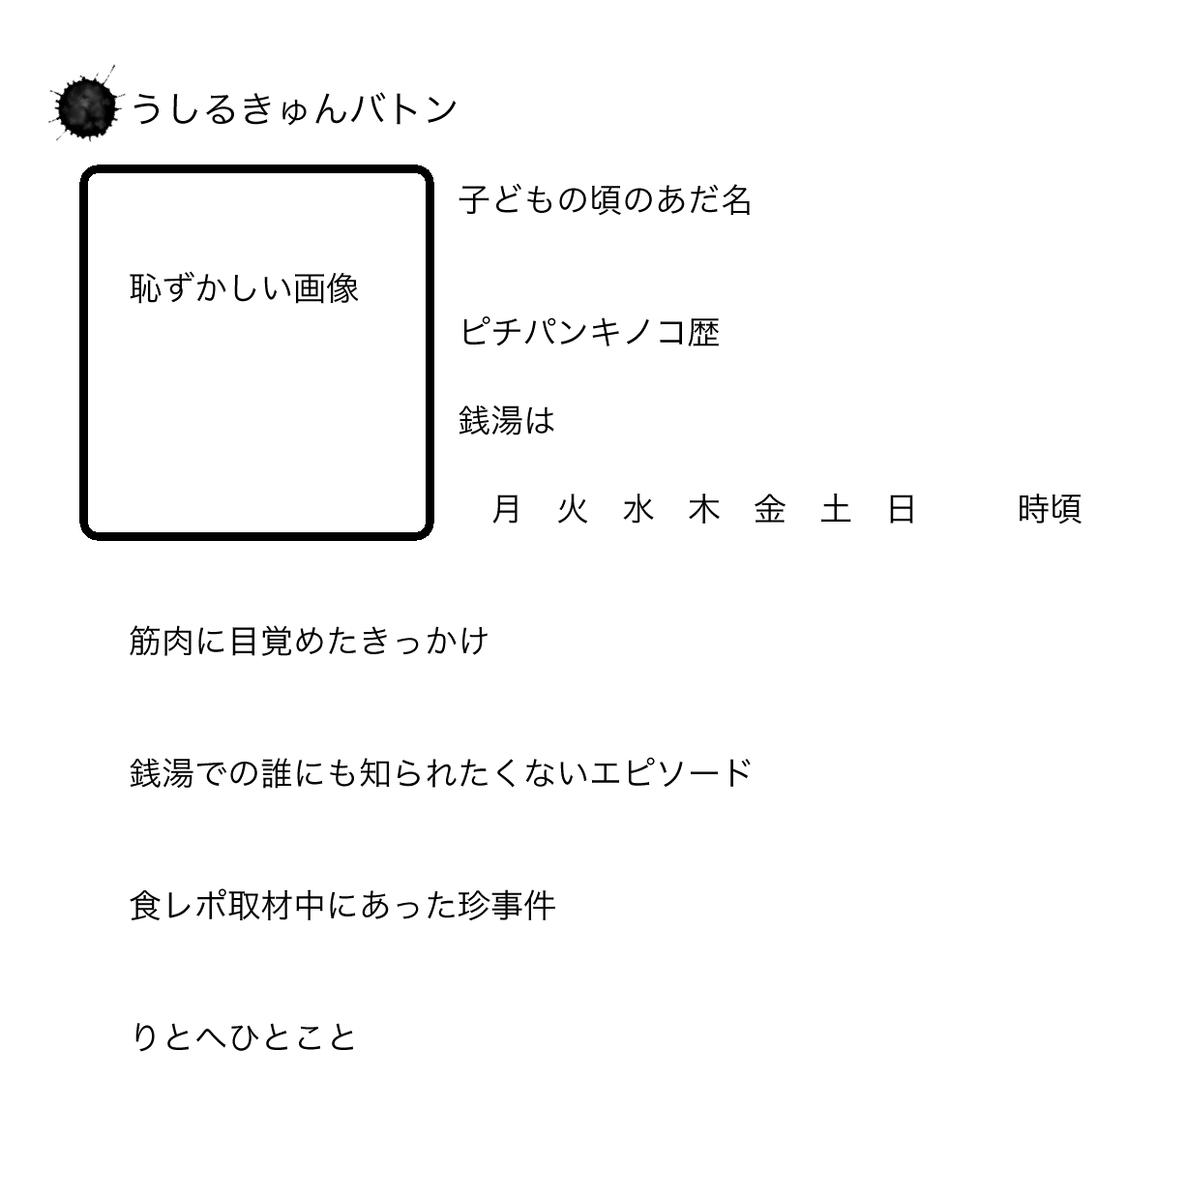 f:id:rito-jh:20200708062509j:plain